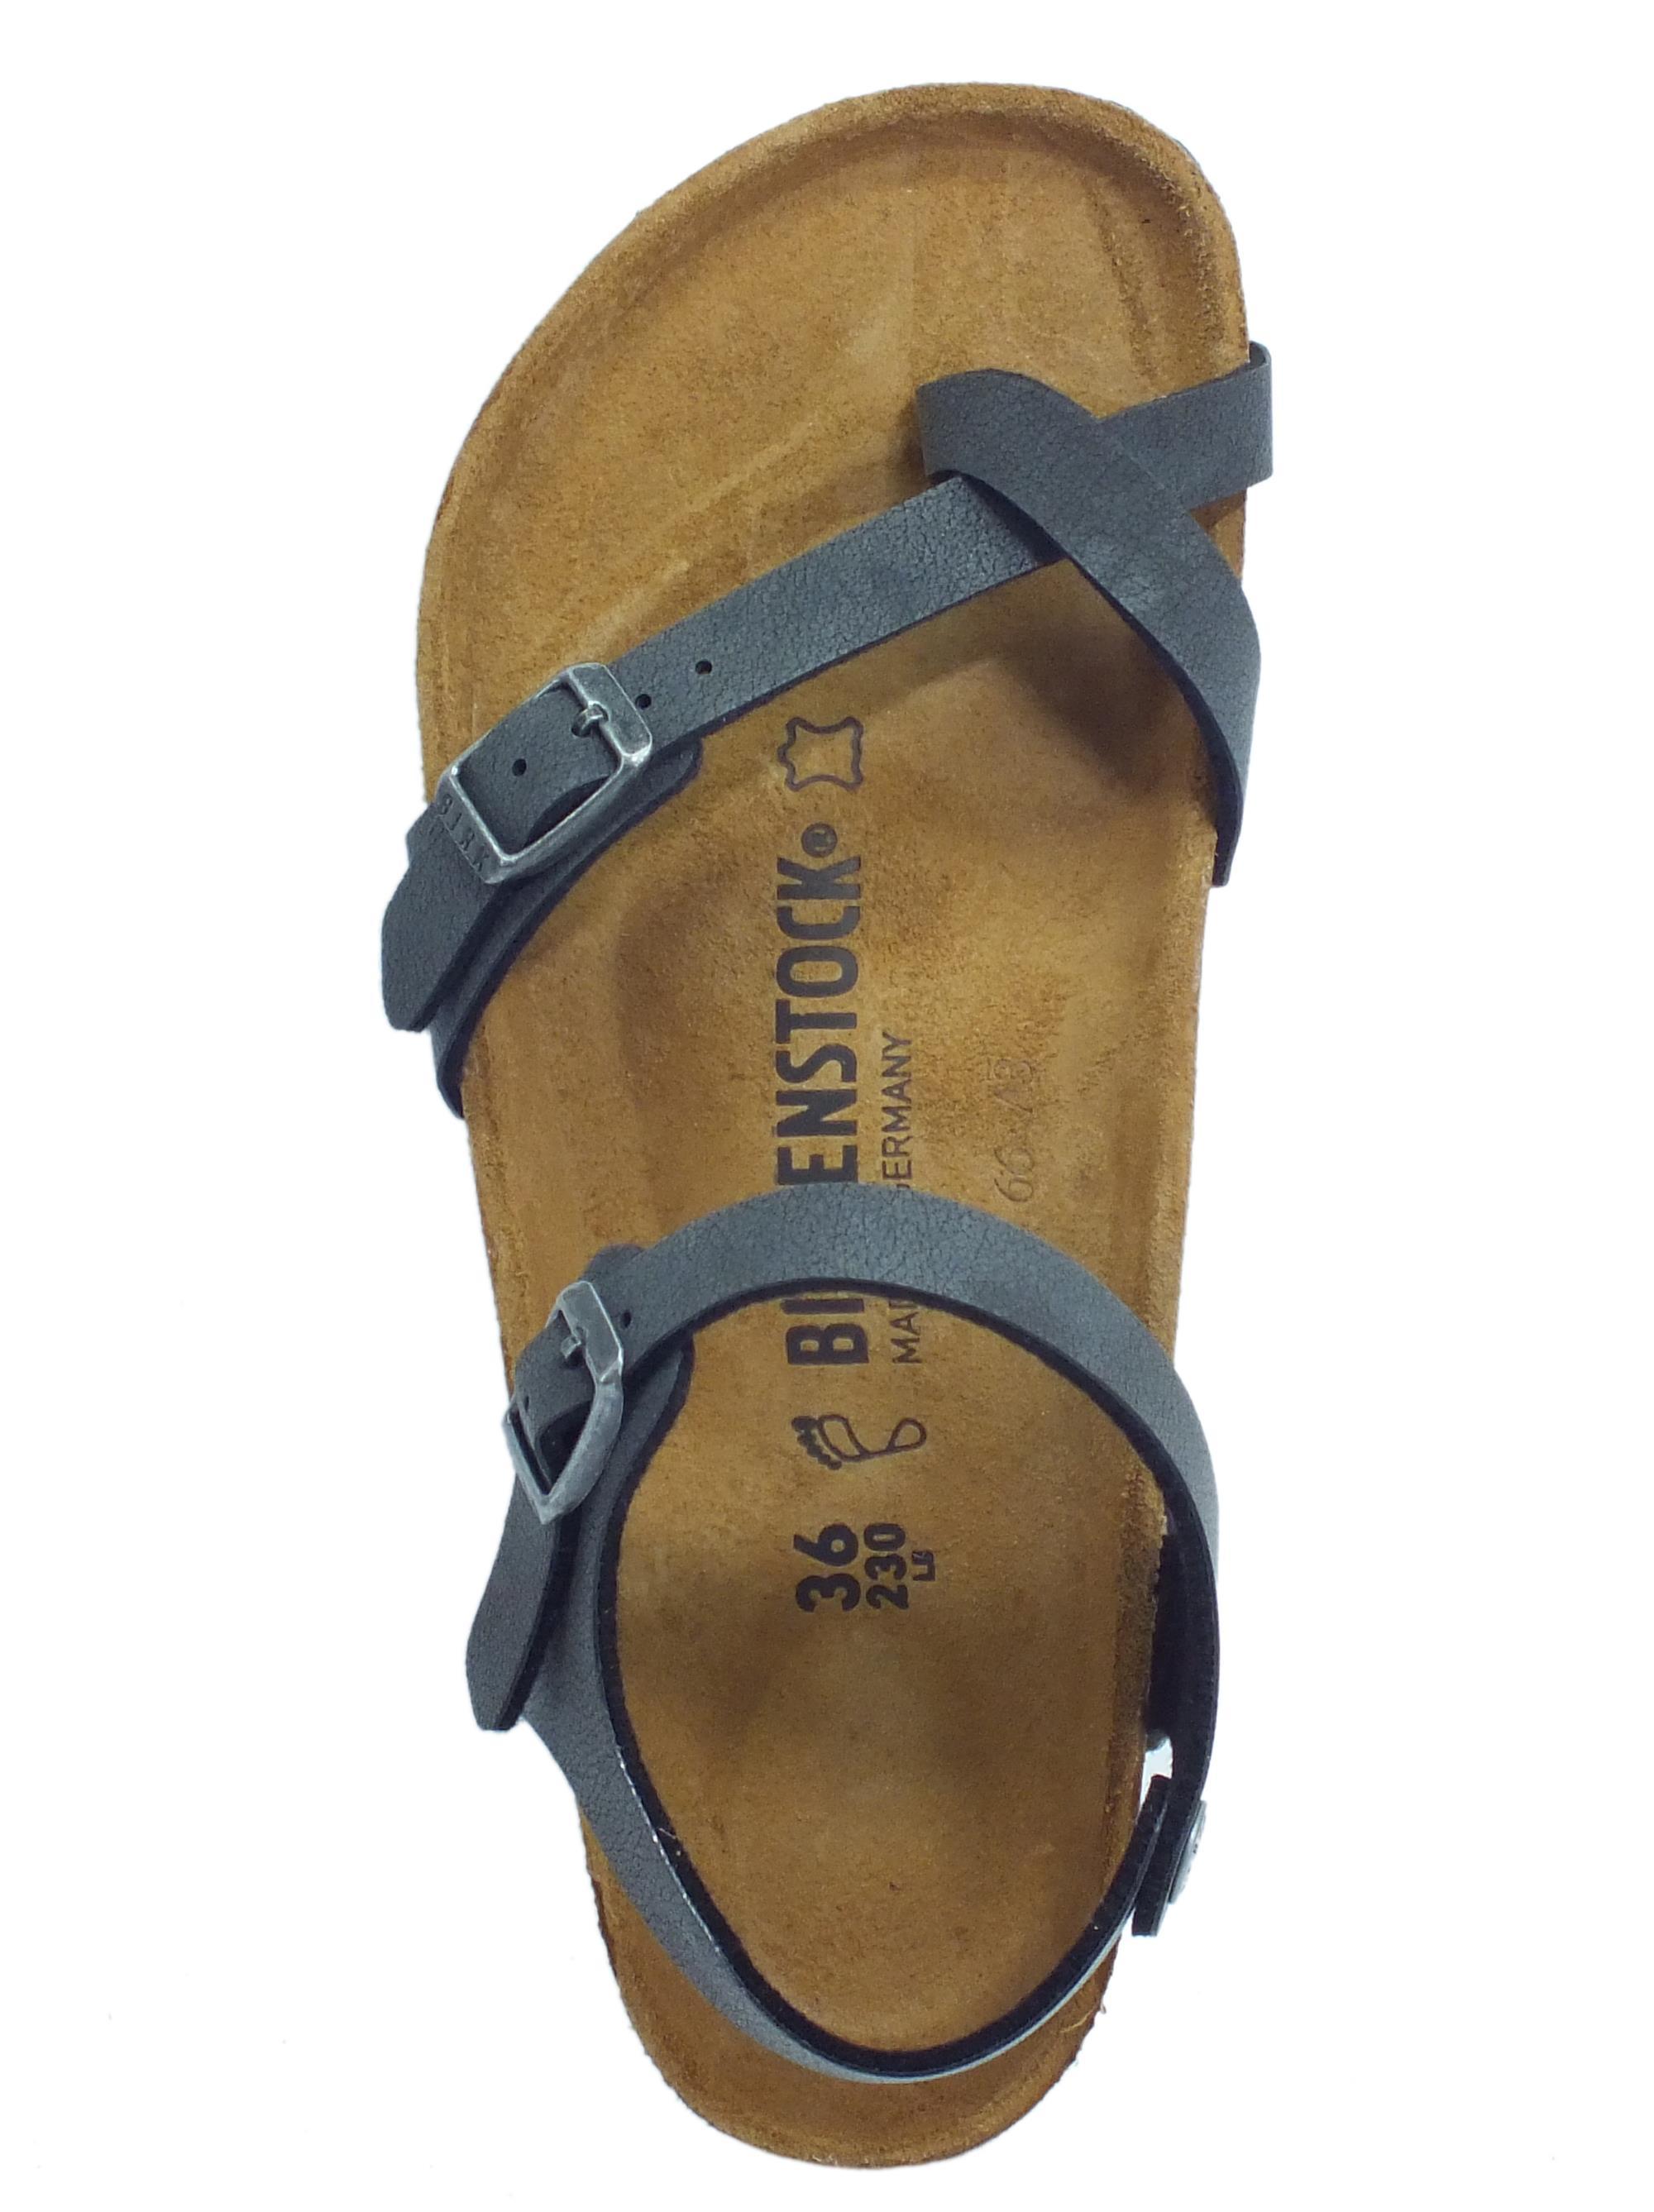 Sandali Birkenstock donna nabuk nero - Vitiello Calzature c3e99afe87d